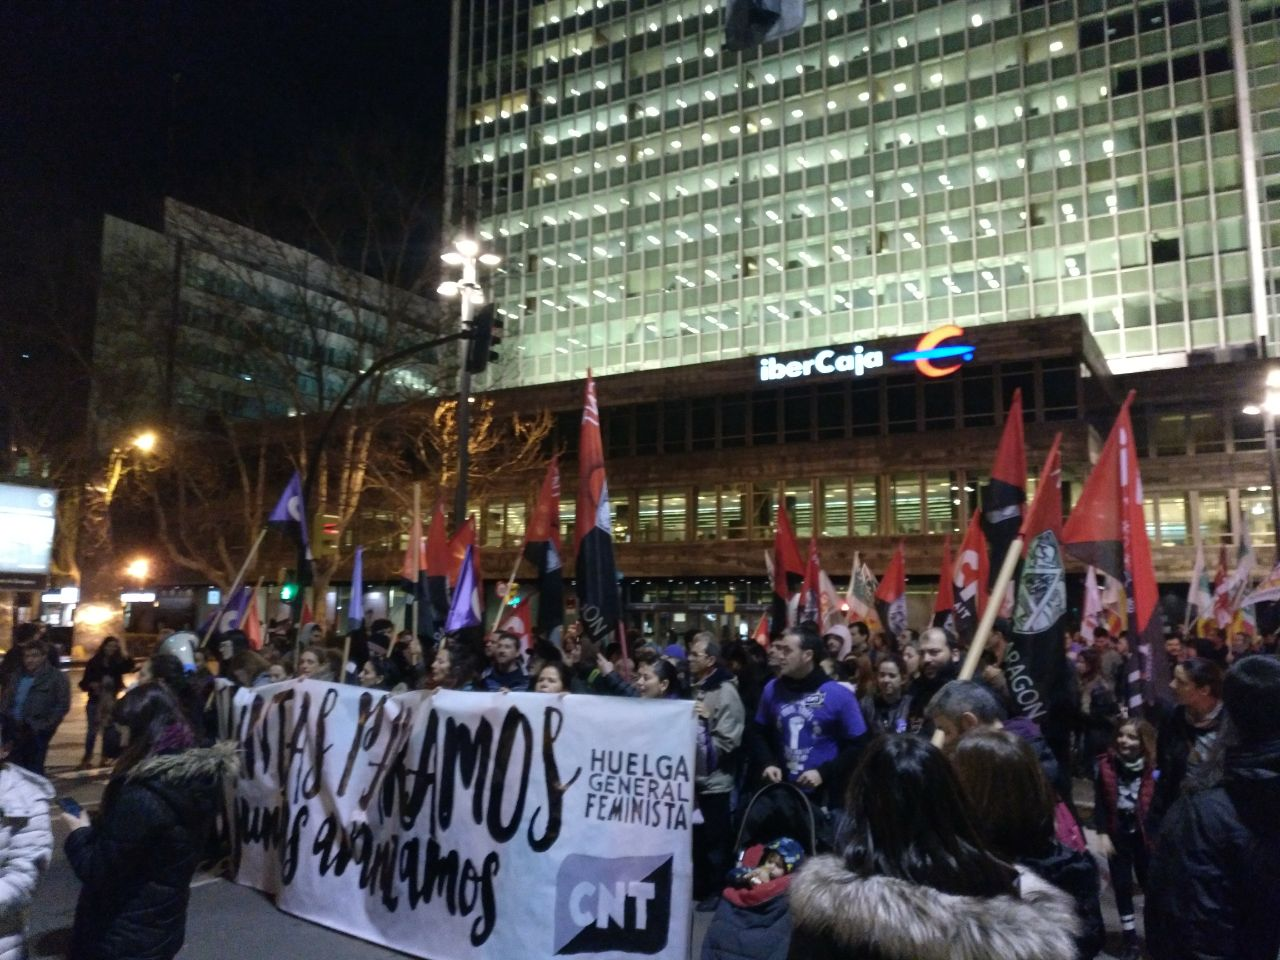 pancarta-cnt-8m-zaragoza-manifestación-noche-saliendo-plaza-aragón-2